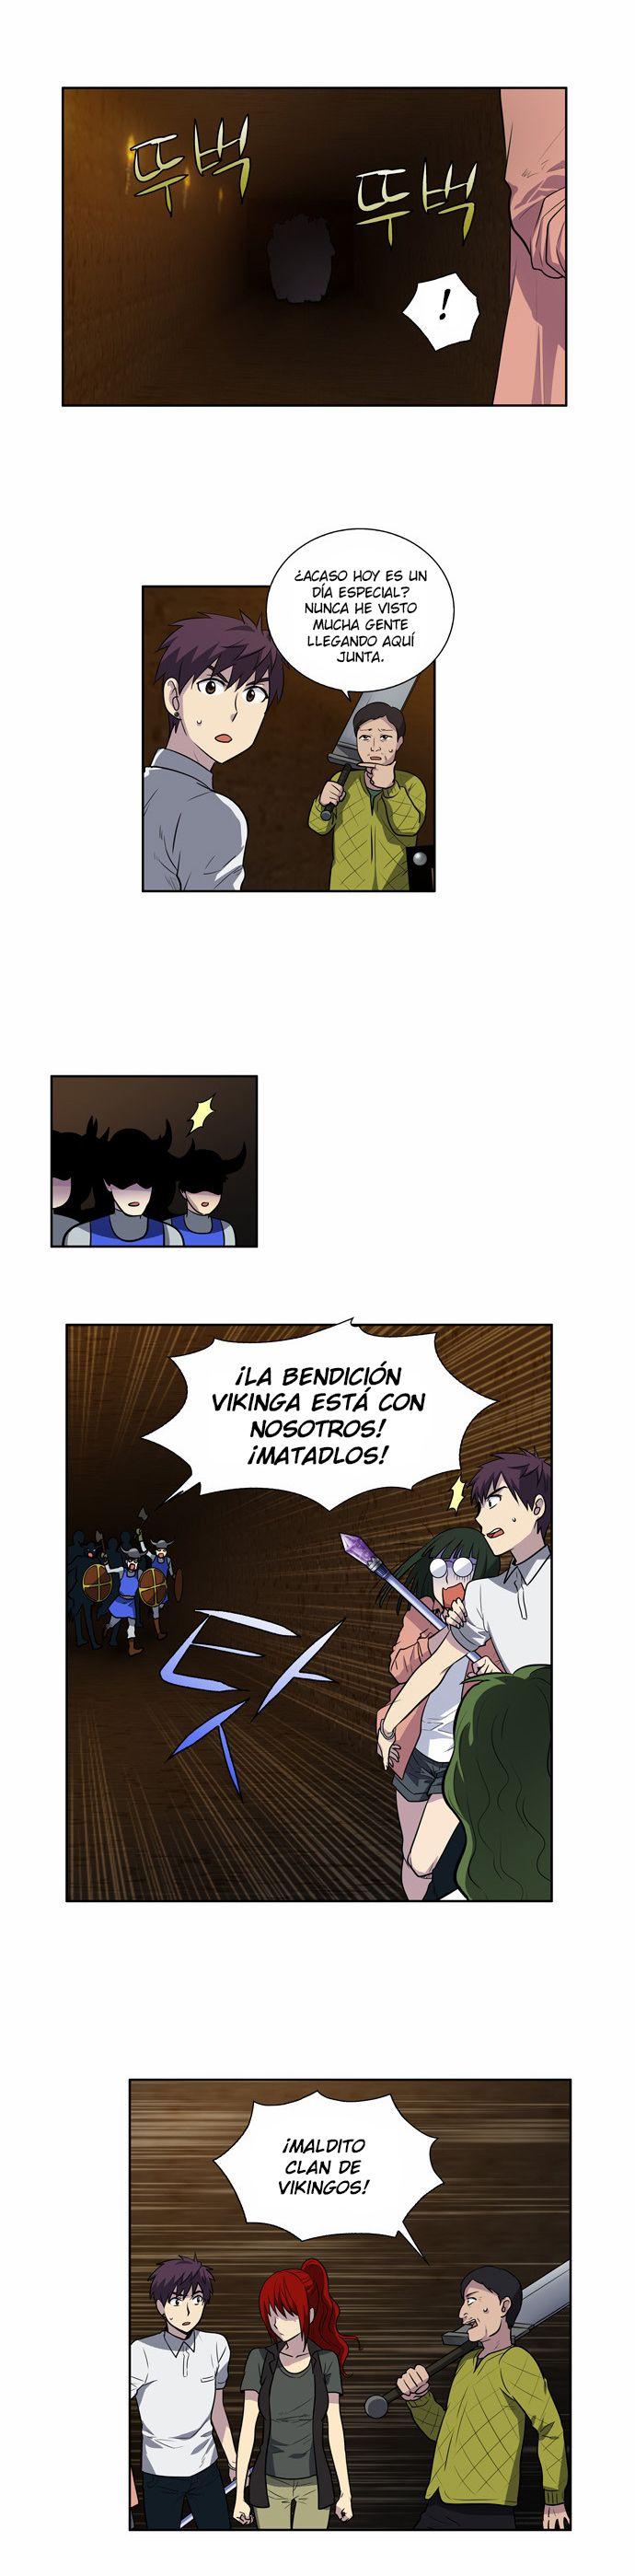 http://c5.ninemanga.com/es_manga/61/1725/479869/232cb406f90fb05666d177dd85d81a3e.jpg Page 6